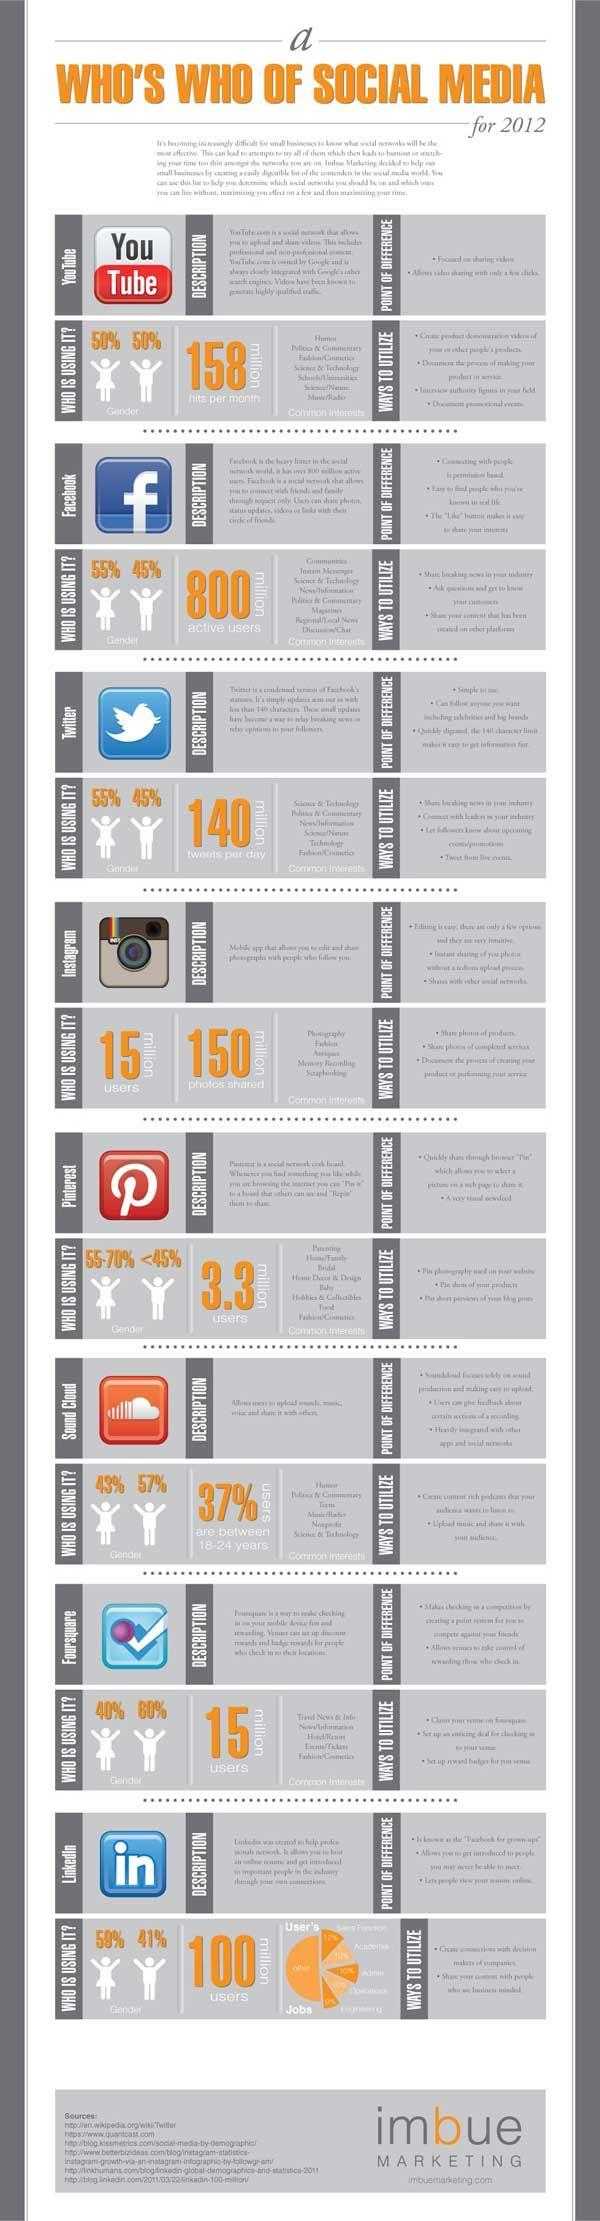 Who's Who of Social Media: Social Network, Media Infographics, Social Media, Media 2012, Media Marketing, Dr. Who, Medium, Rede Social, Infographics Socialmedia